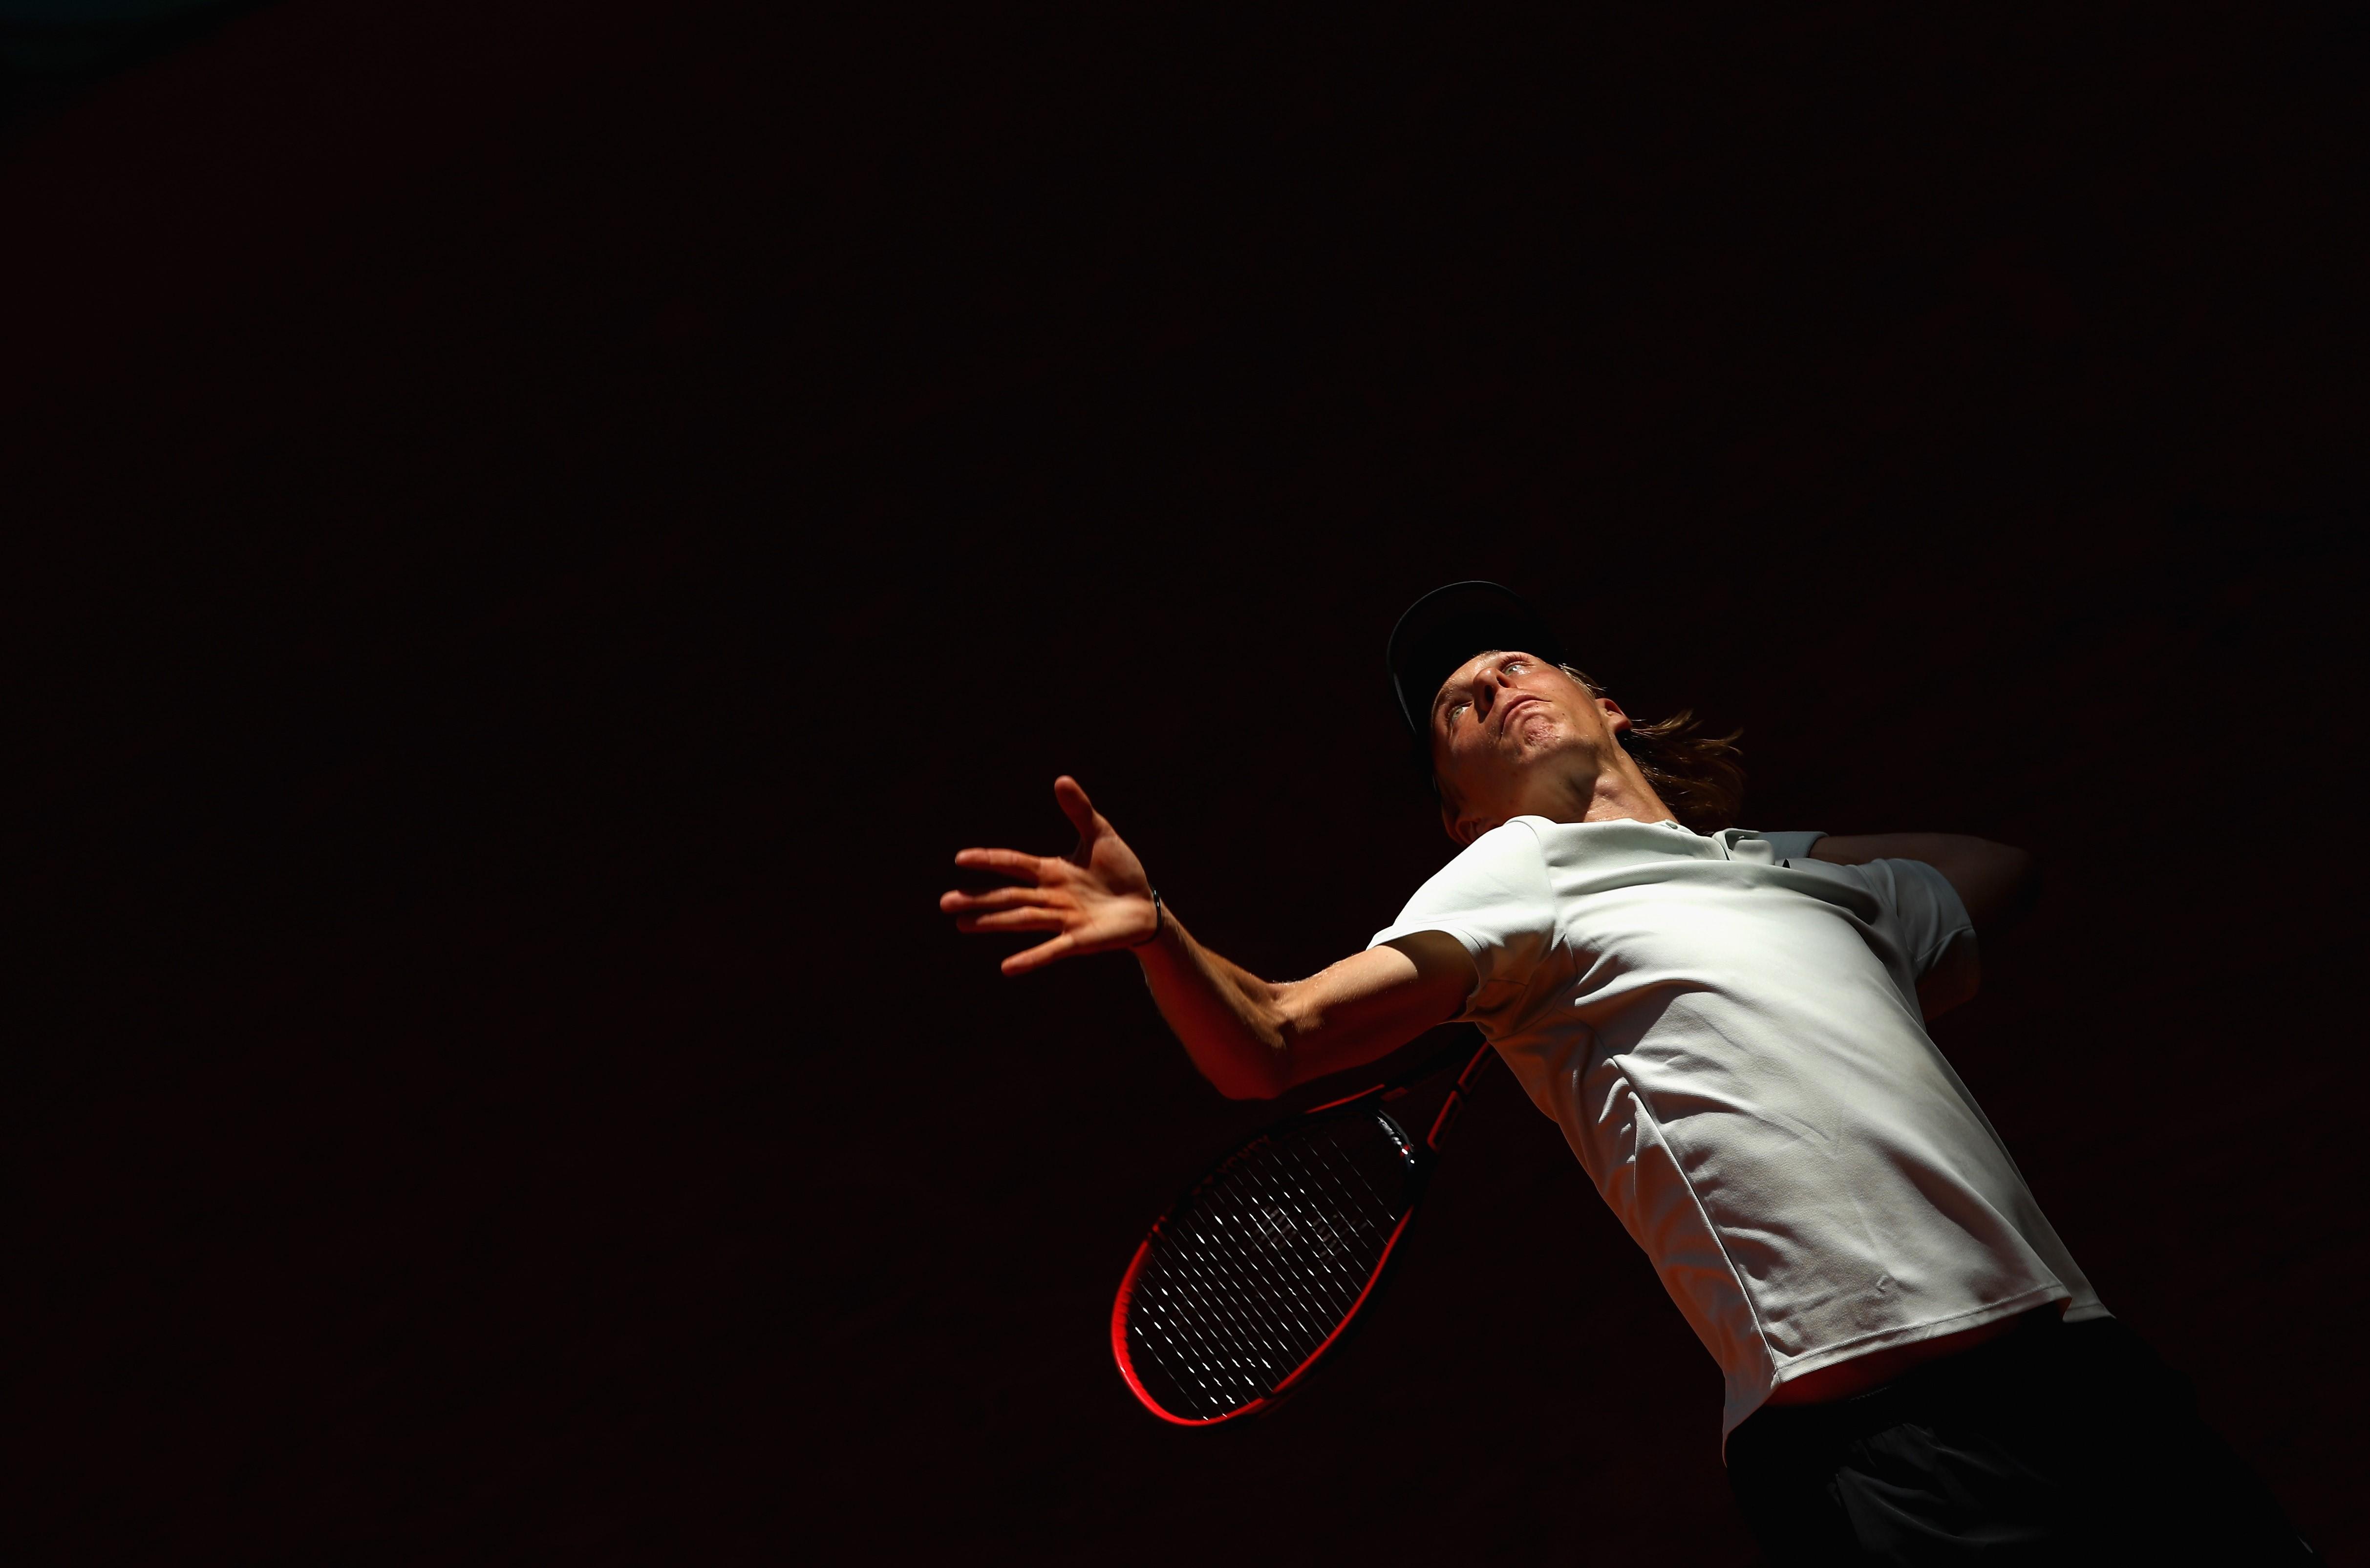 Denis Shapovalov lors du Masters 1000 de Madrid